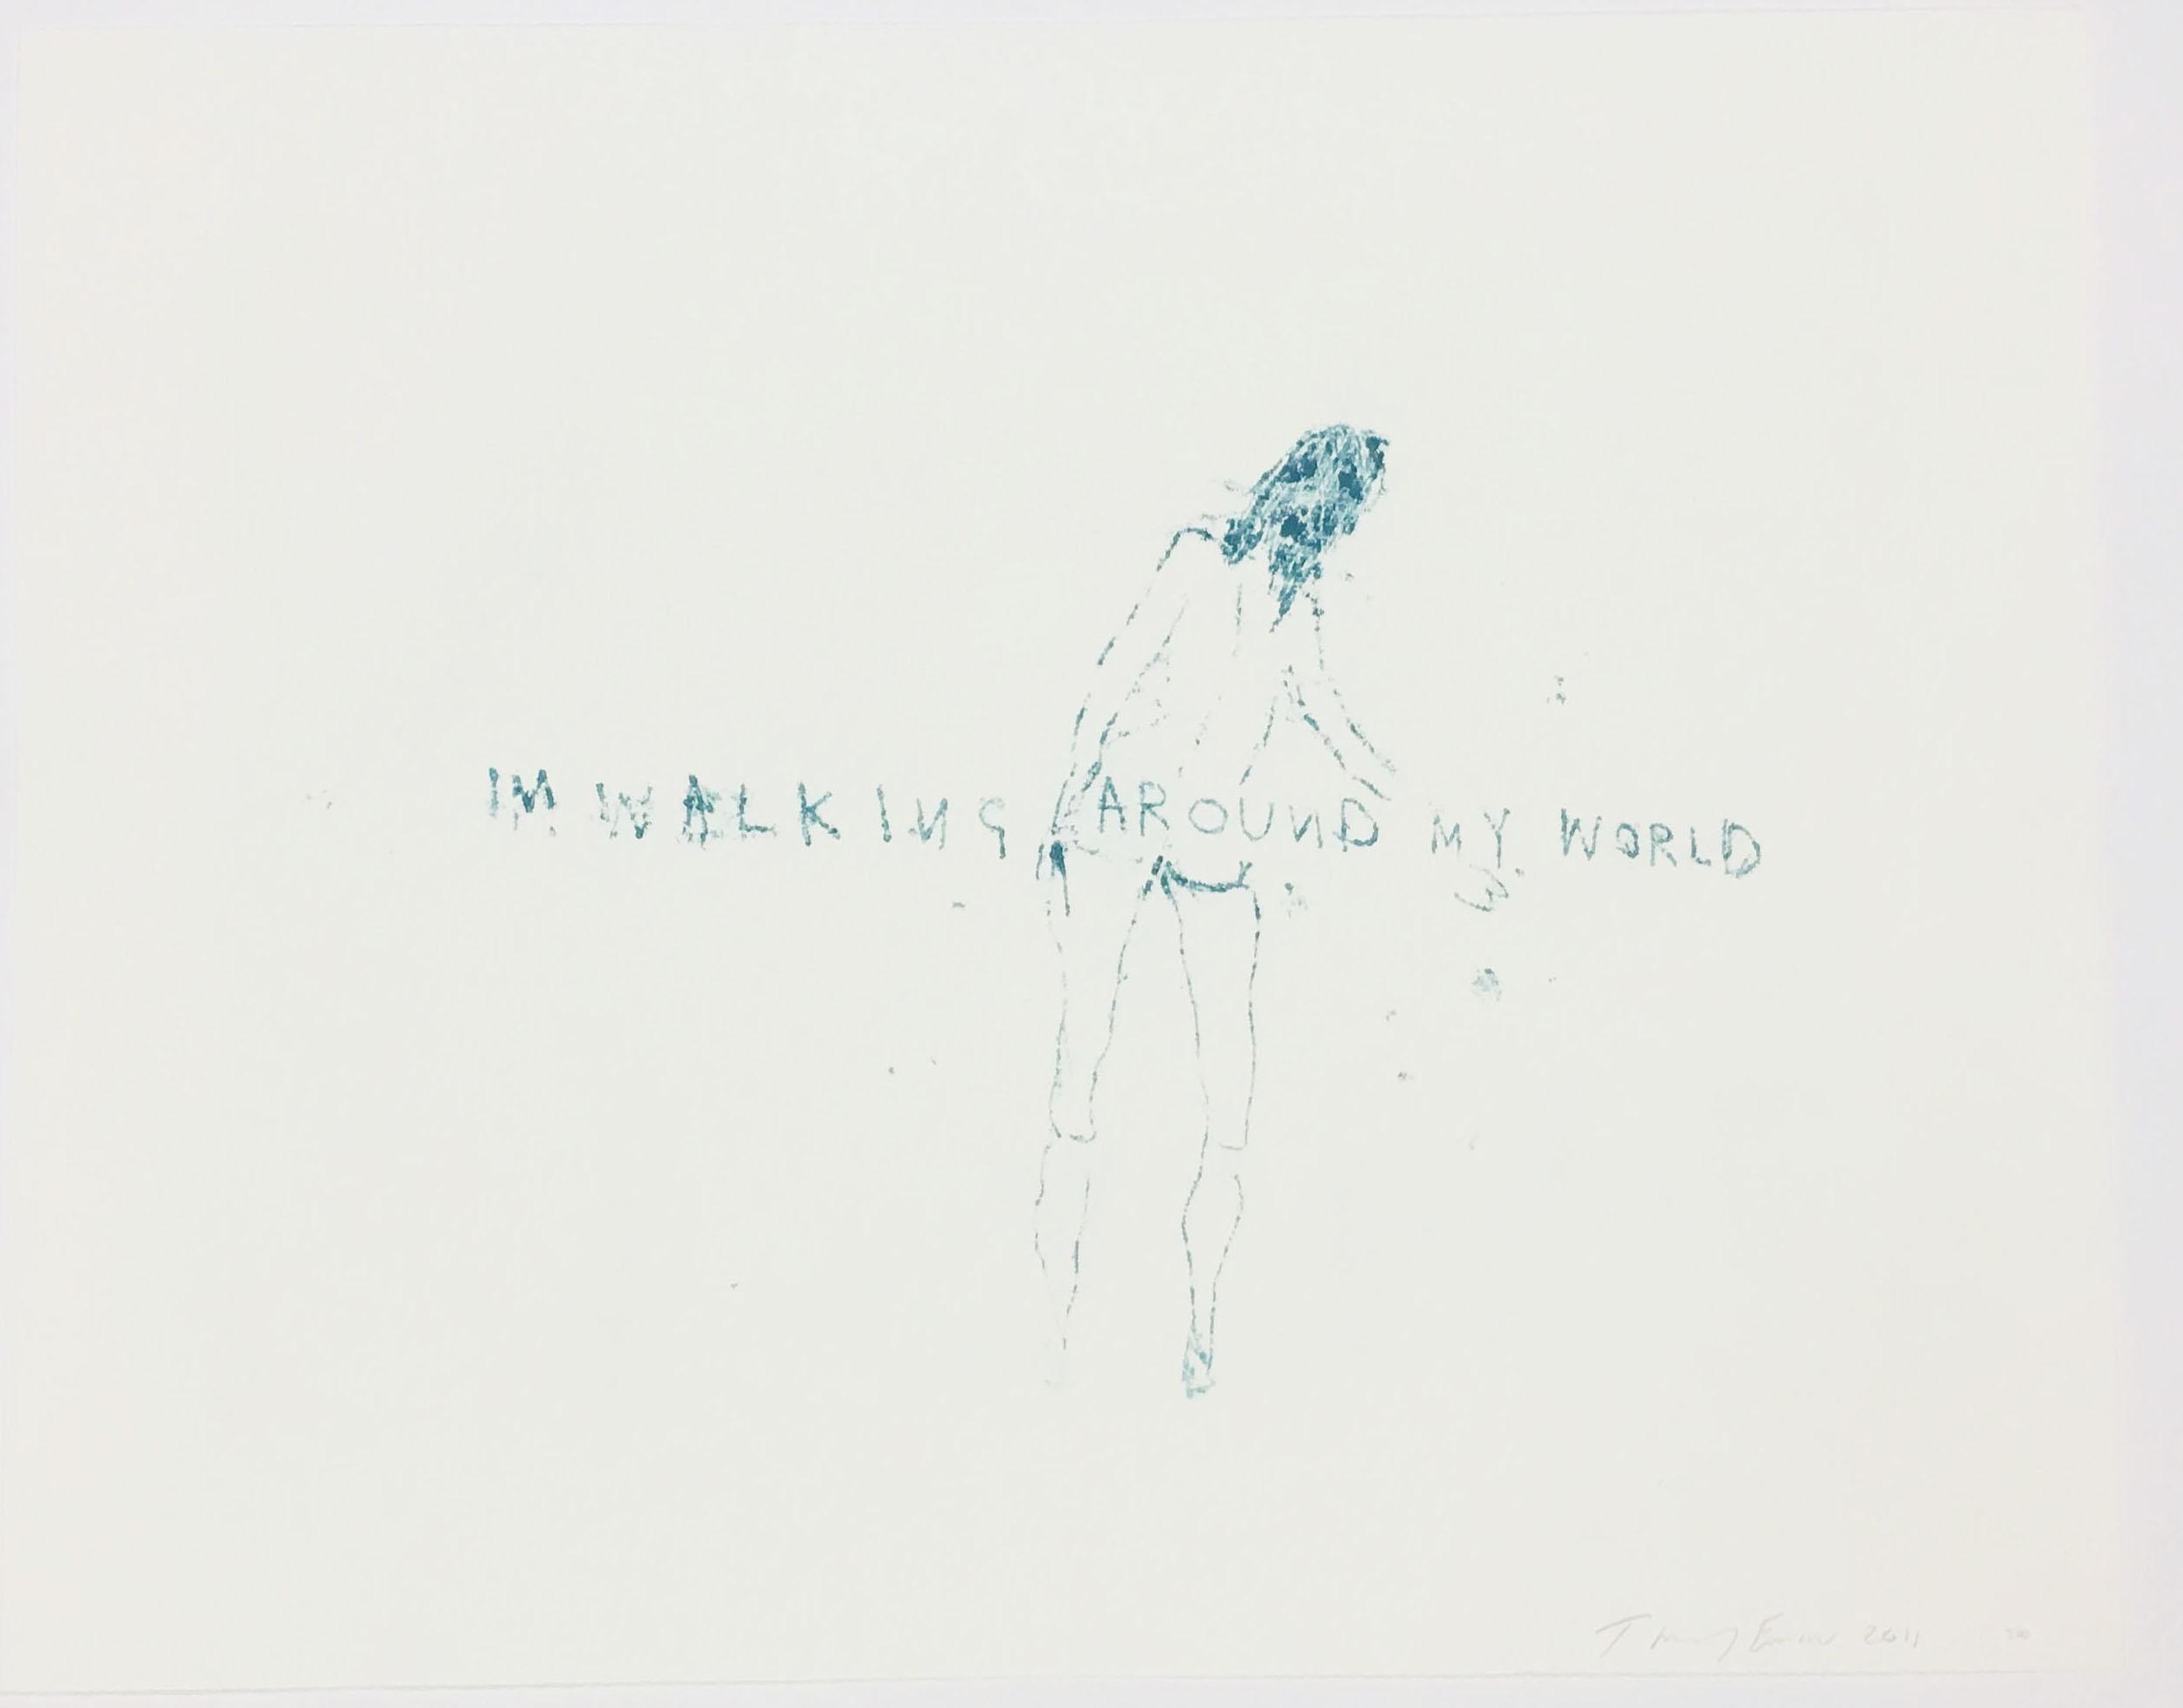 I'm Walking Around My World by Tracey Emin